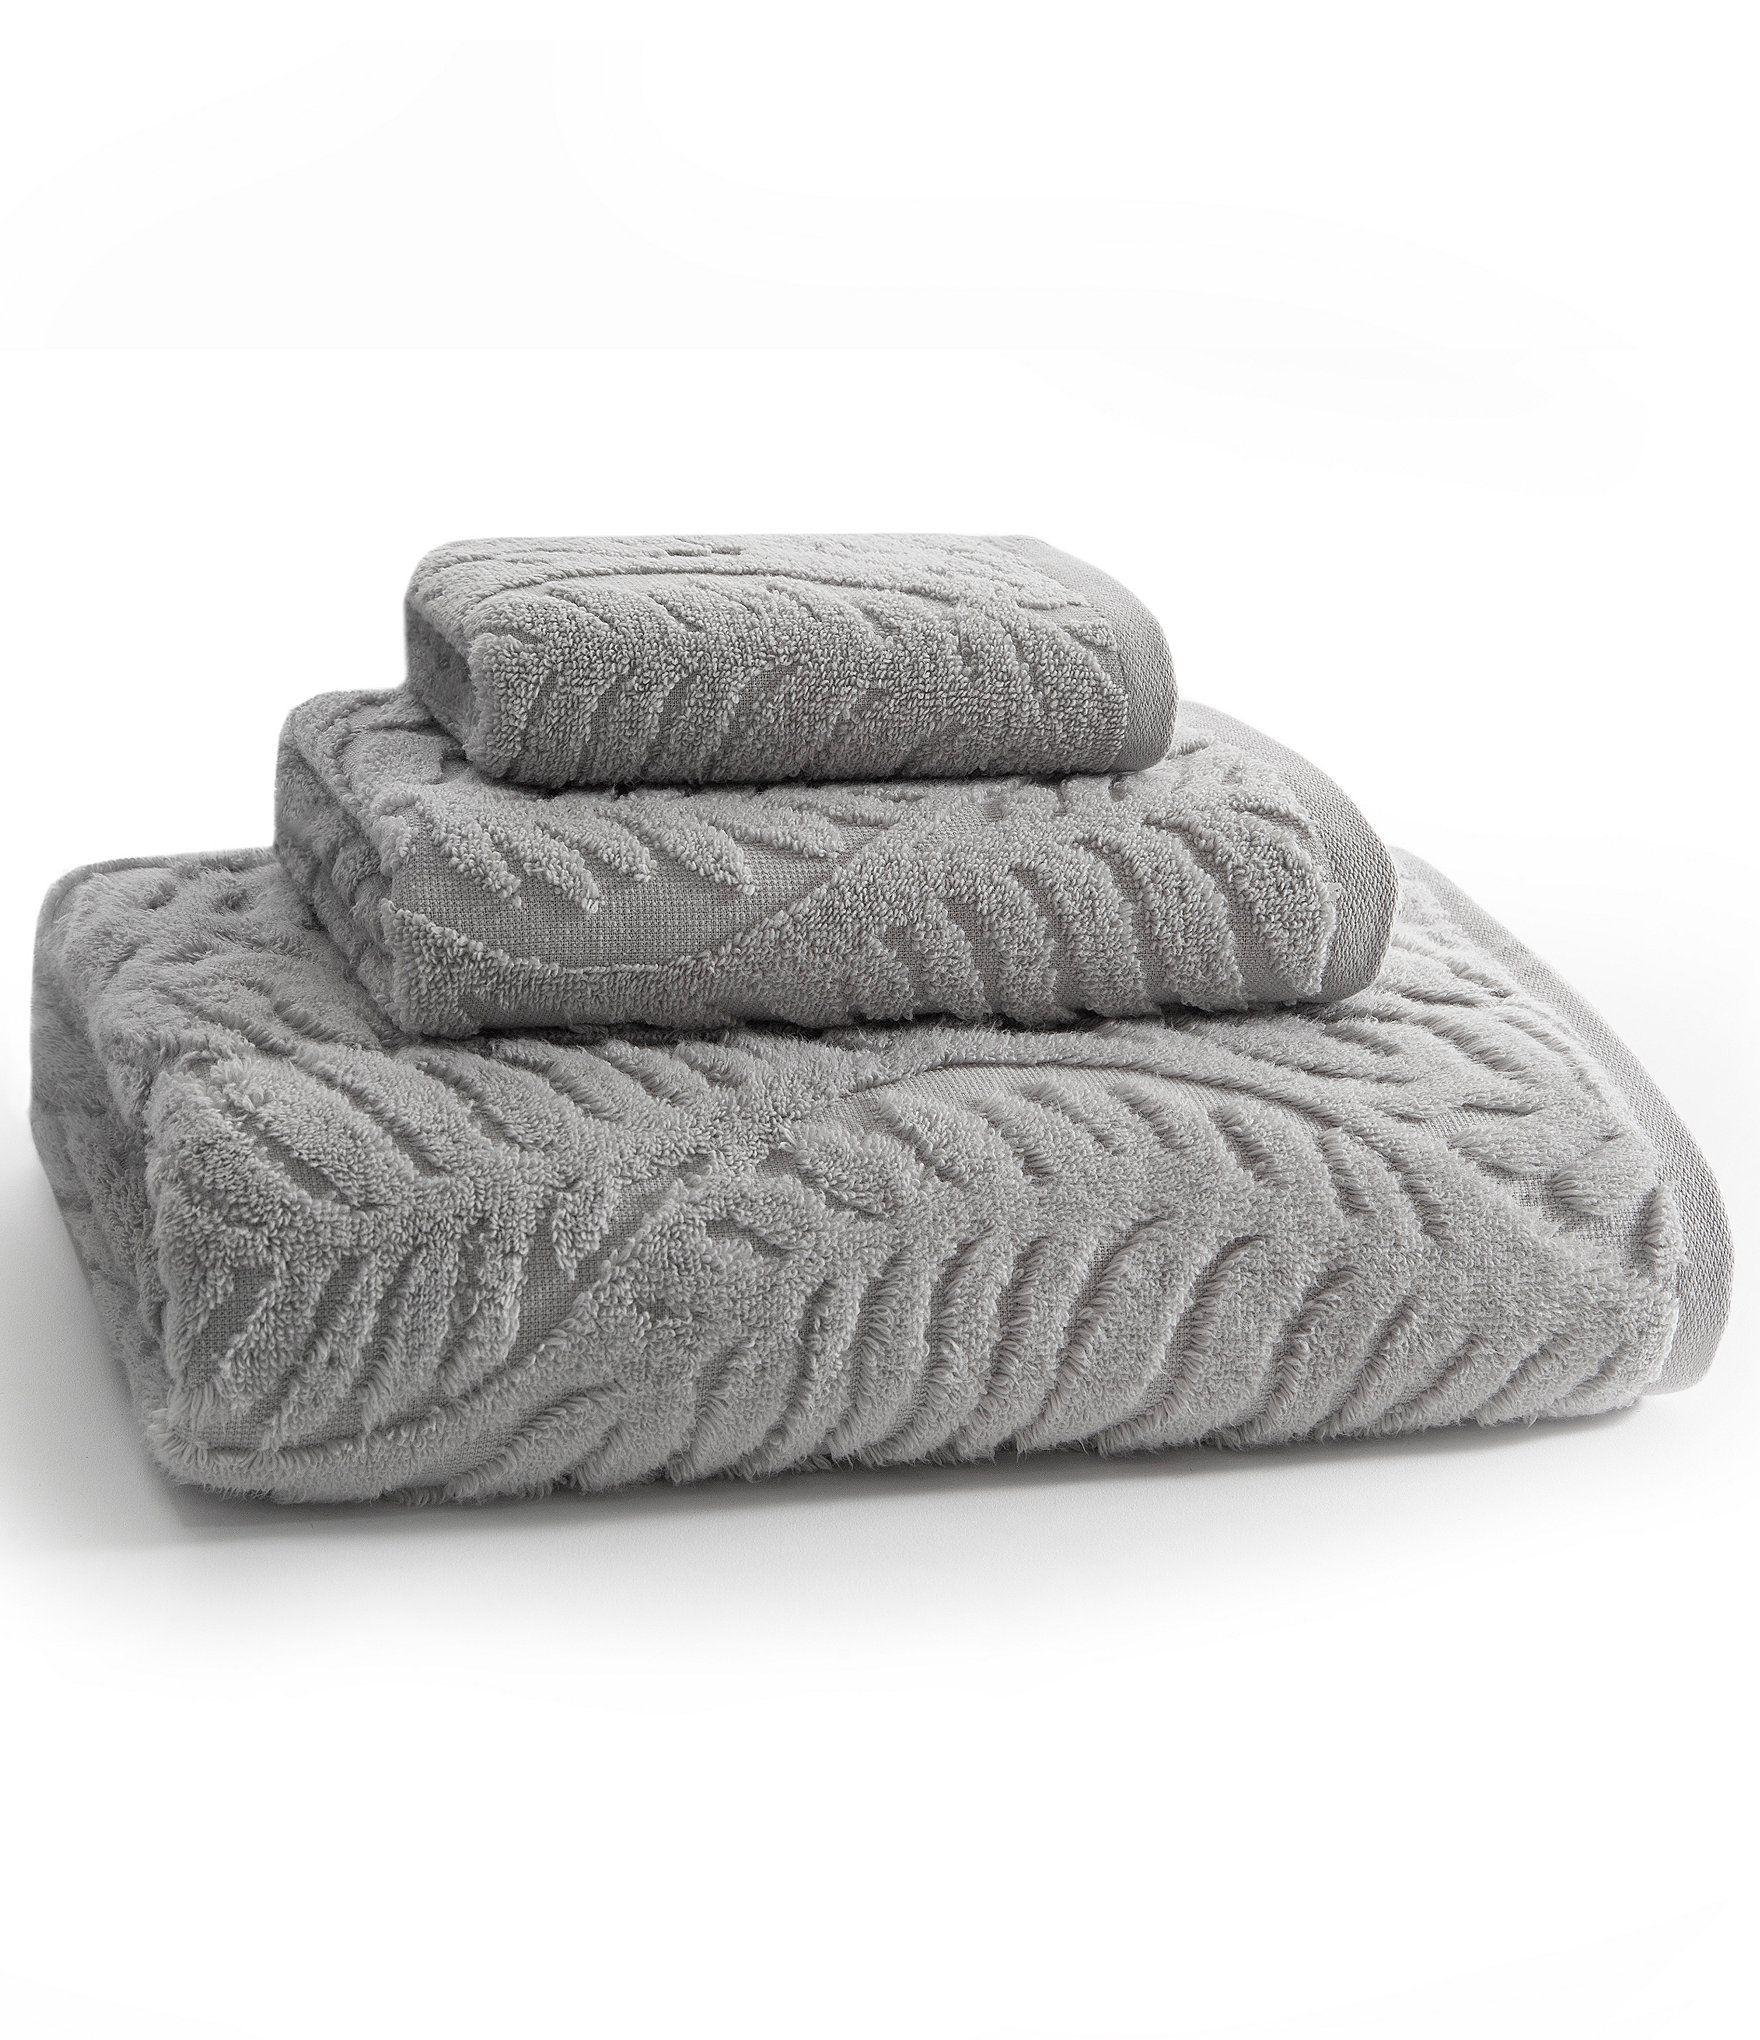 Kassatex Palma Combed Long Staple Turkish Cotton Bath Towels In